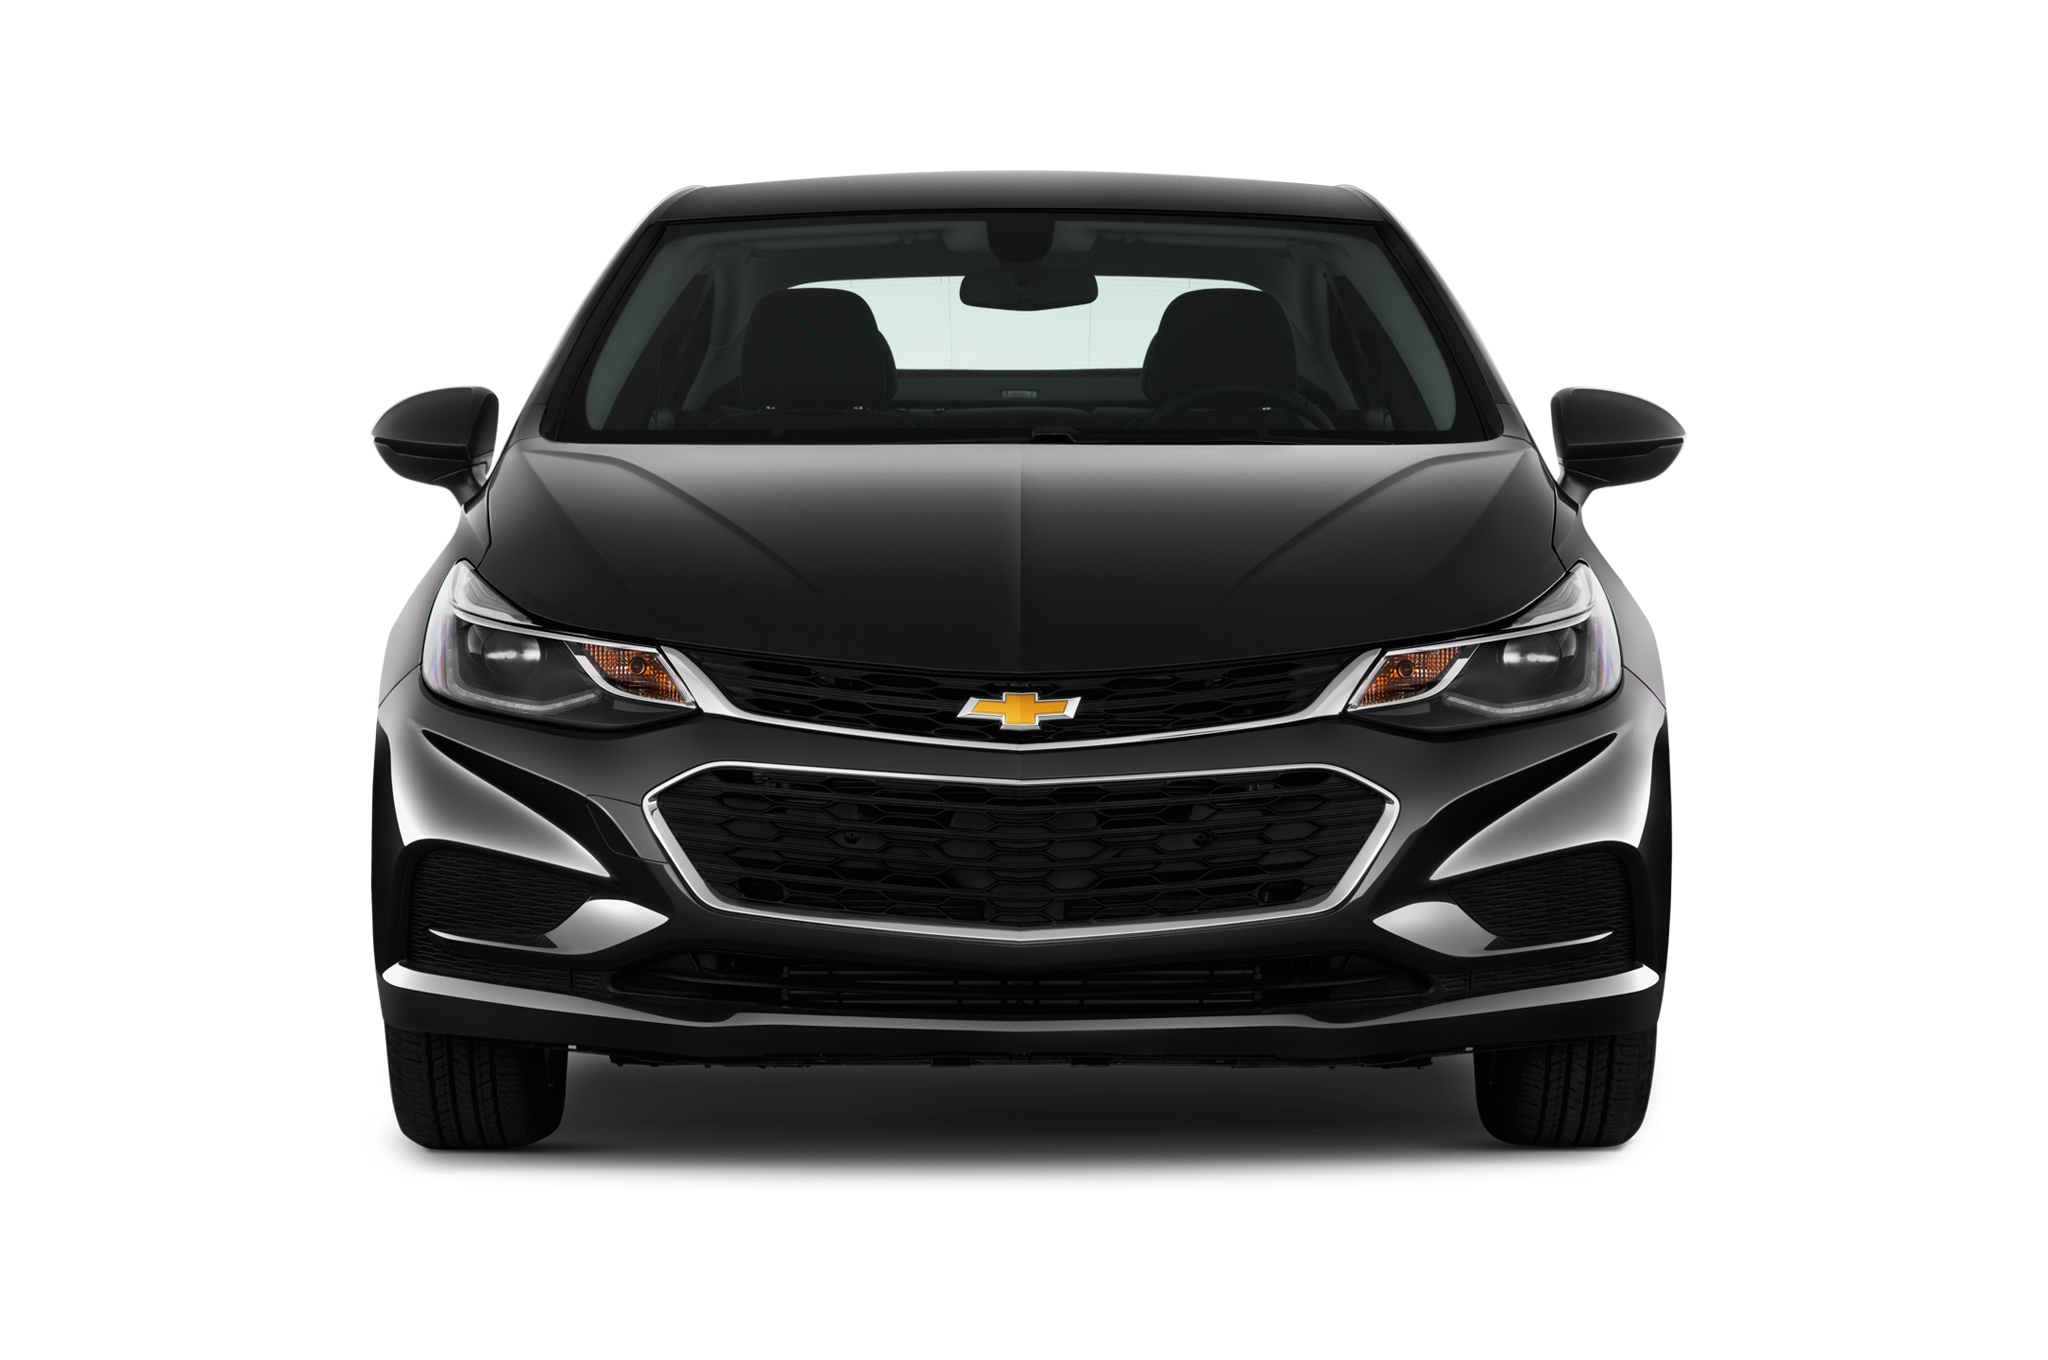 2017 Chevrolet Cruze Hatch Unveiled Ahead of Detroit Debut